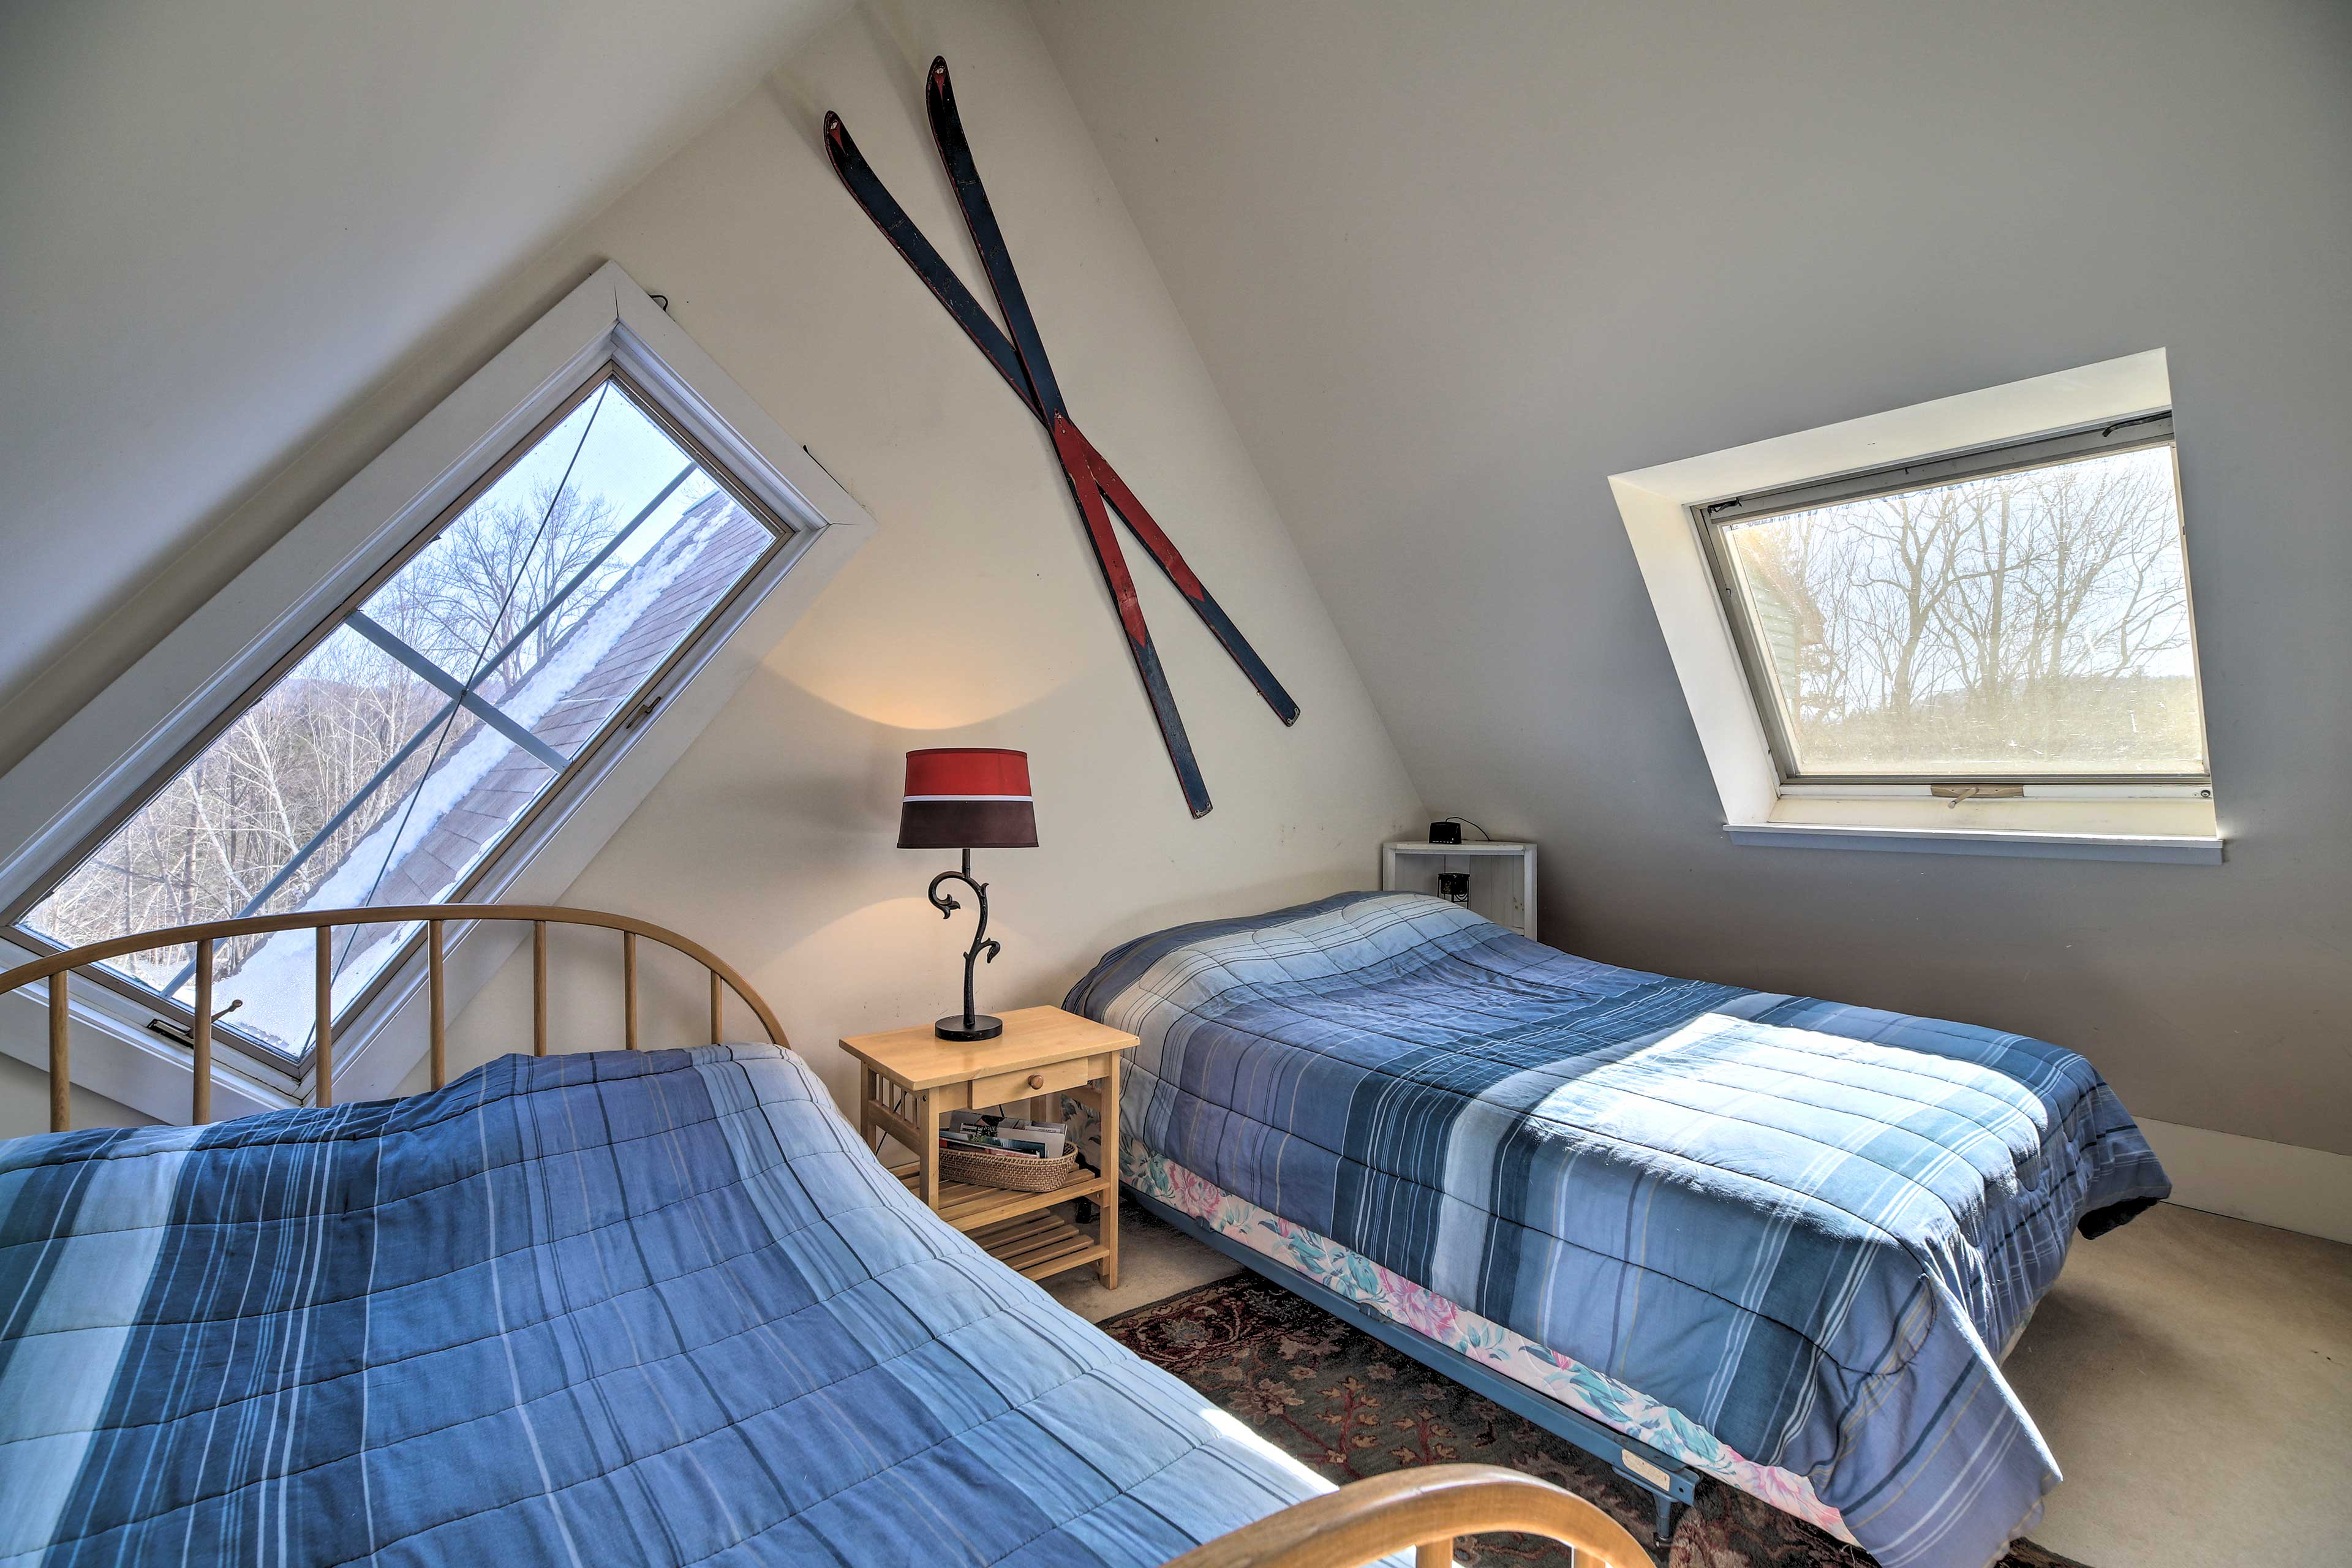 Upstairs, this bedroom sleeps 4 guests in the 2 queen beds.